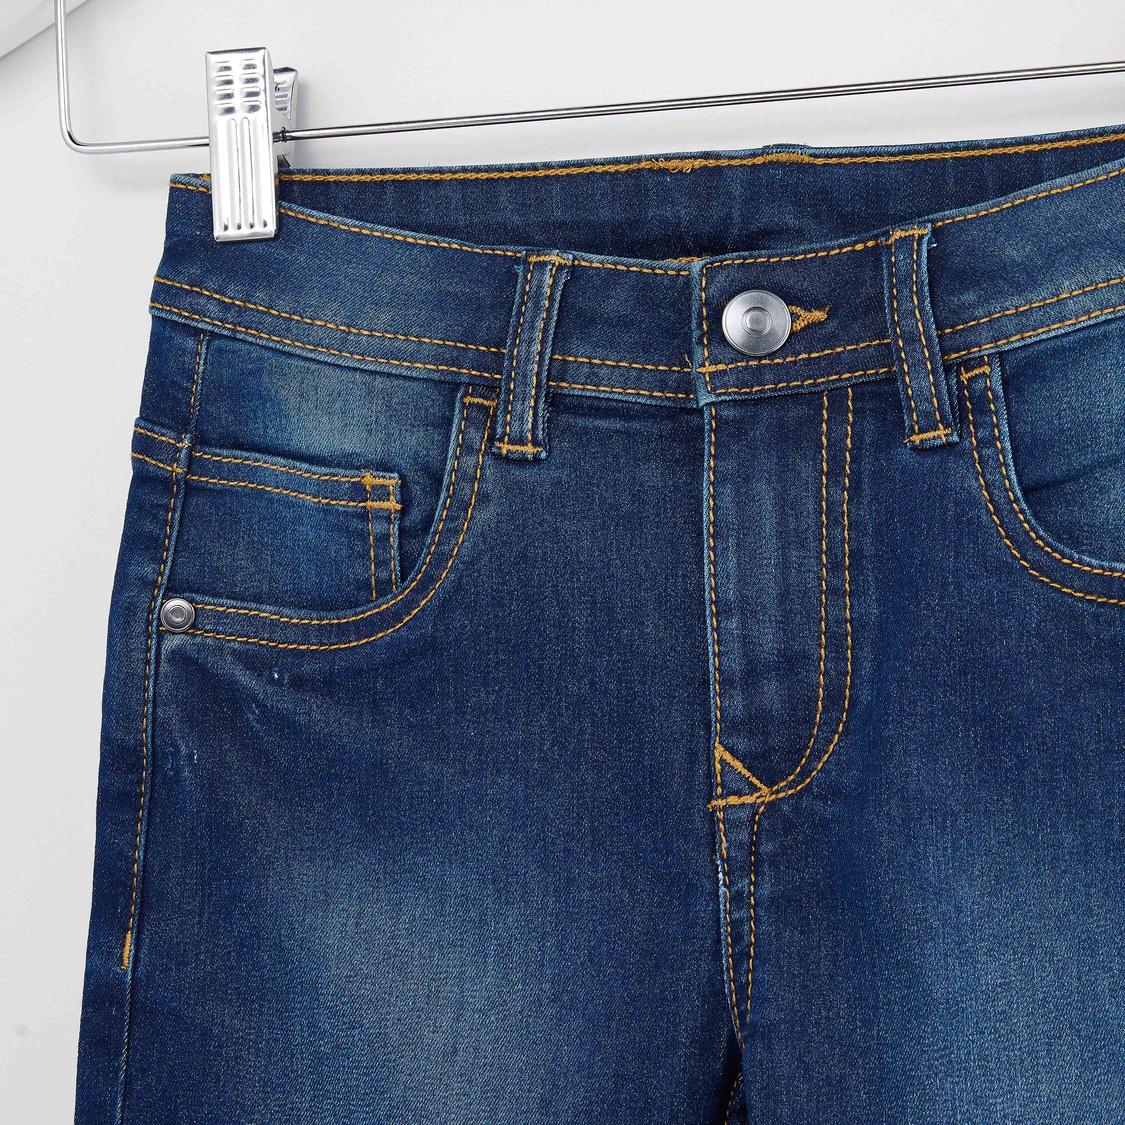 Plain Denim Shorts with Pocket Detail and Belt Loops